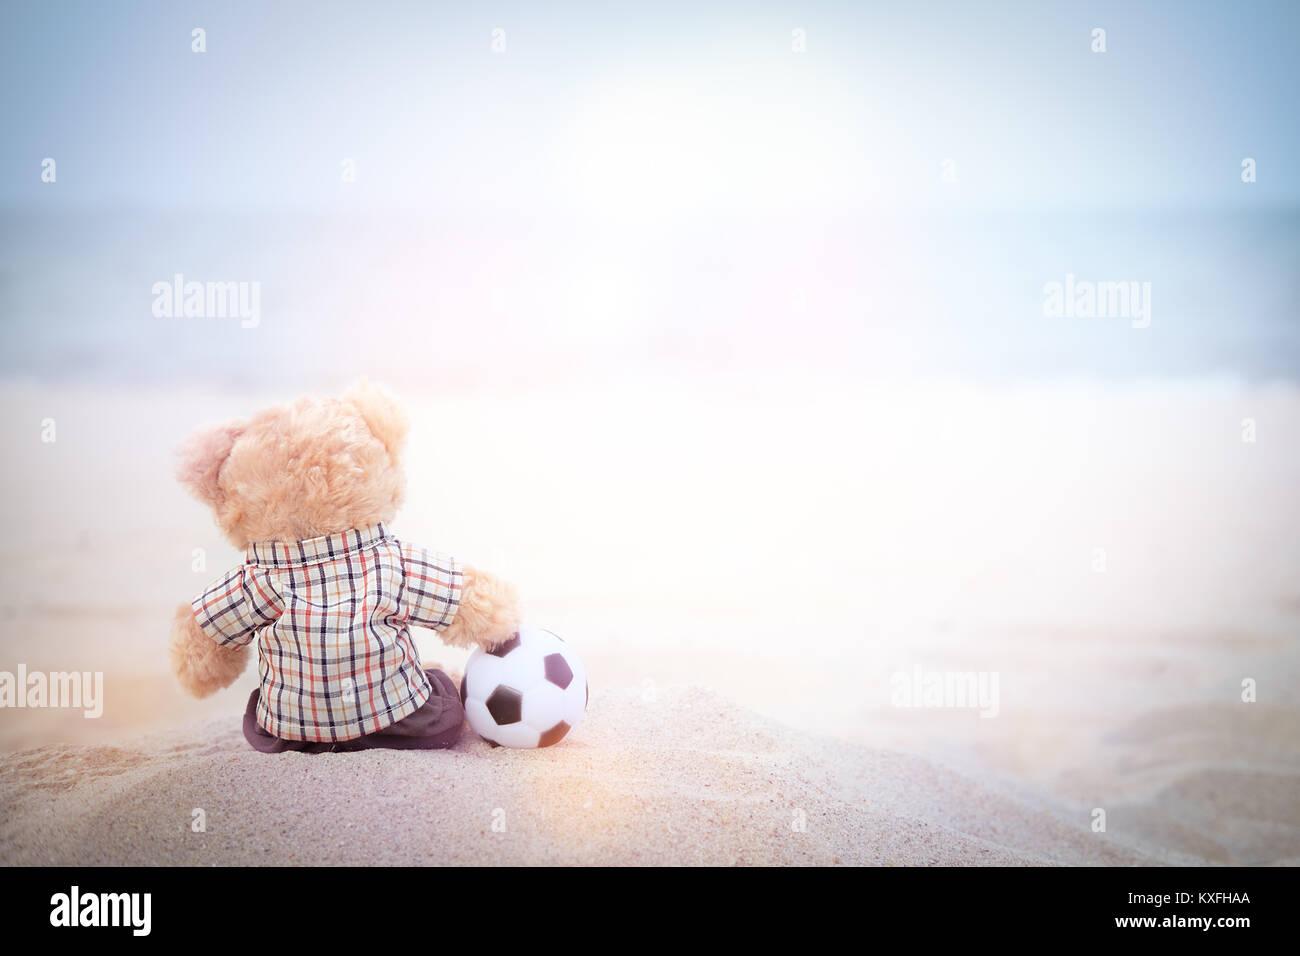 Teddy Bear Sea Imágenes De Stock & Teddy Bear Sea Fotos De Stock - Alamy